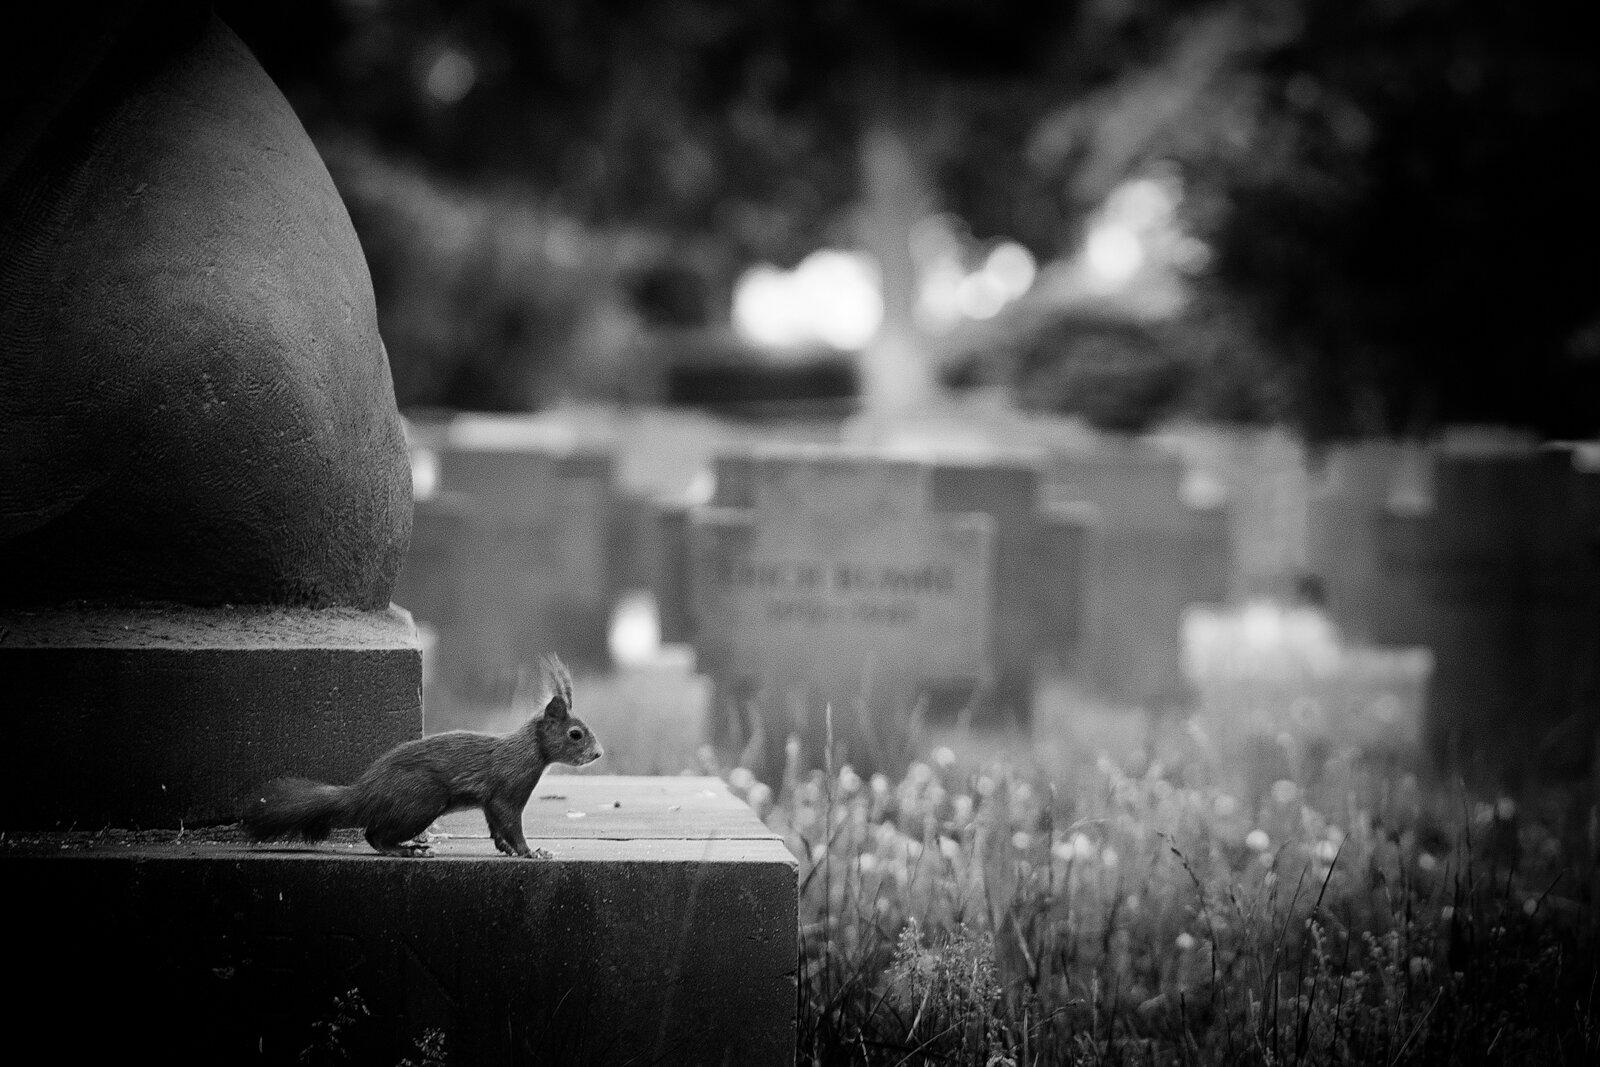 10__D7C0241_2014_05_Friedhof-Edit-4-Edit-2____Friedhof-KA.jpg